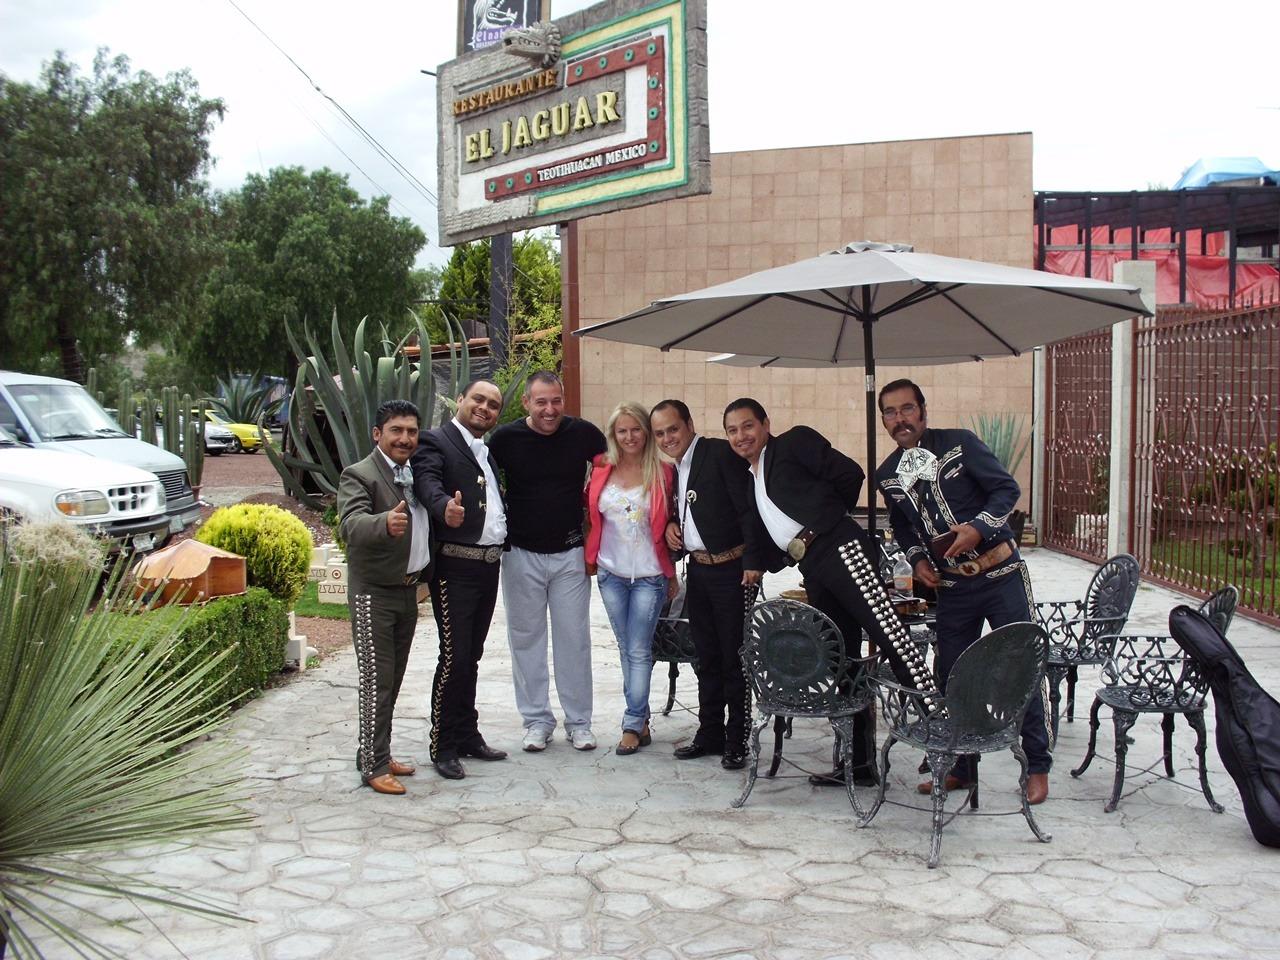 Meksiko-kada porastem biću kralj narko kartela